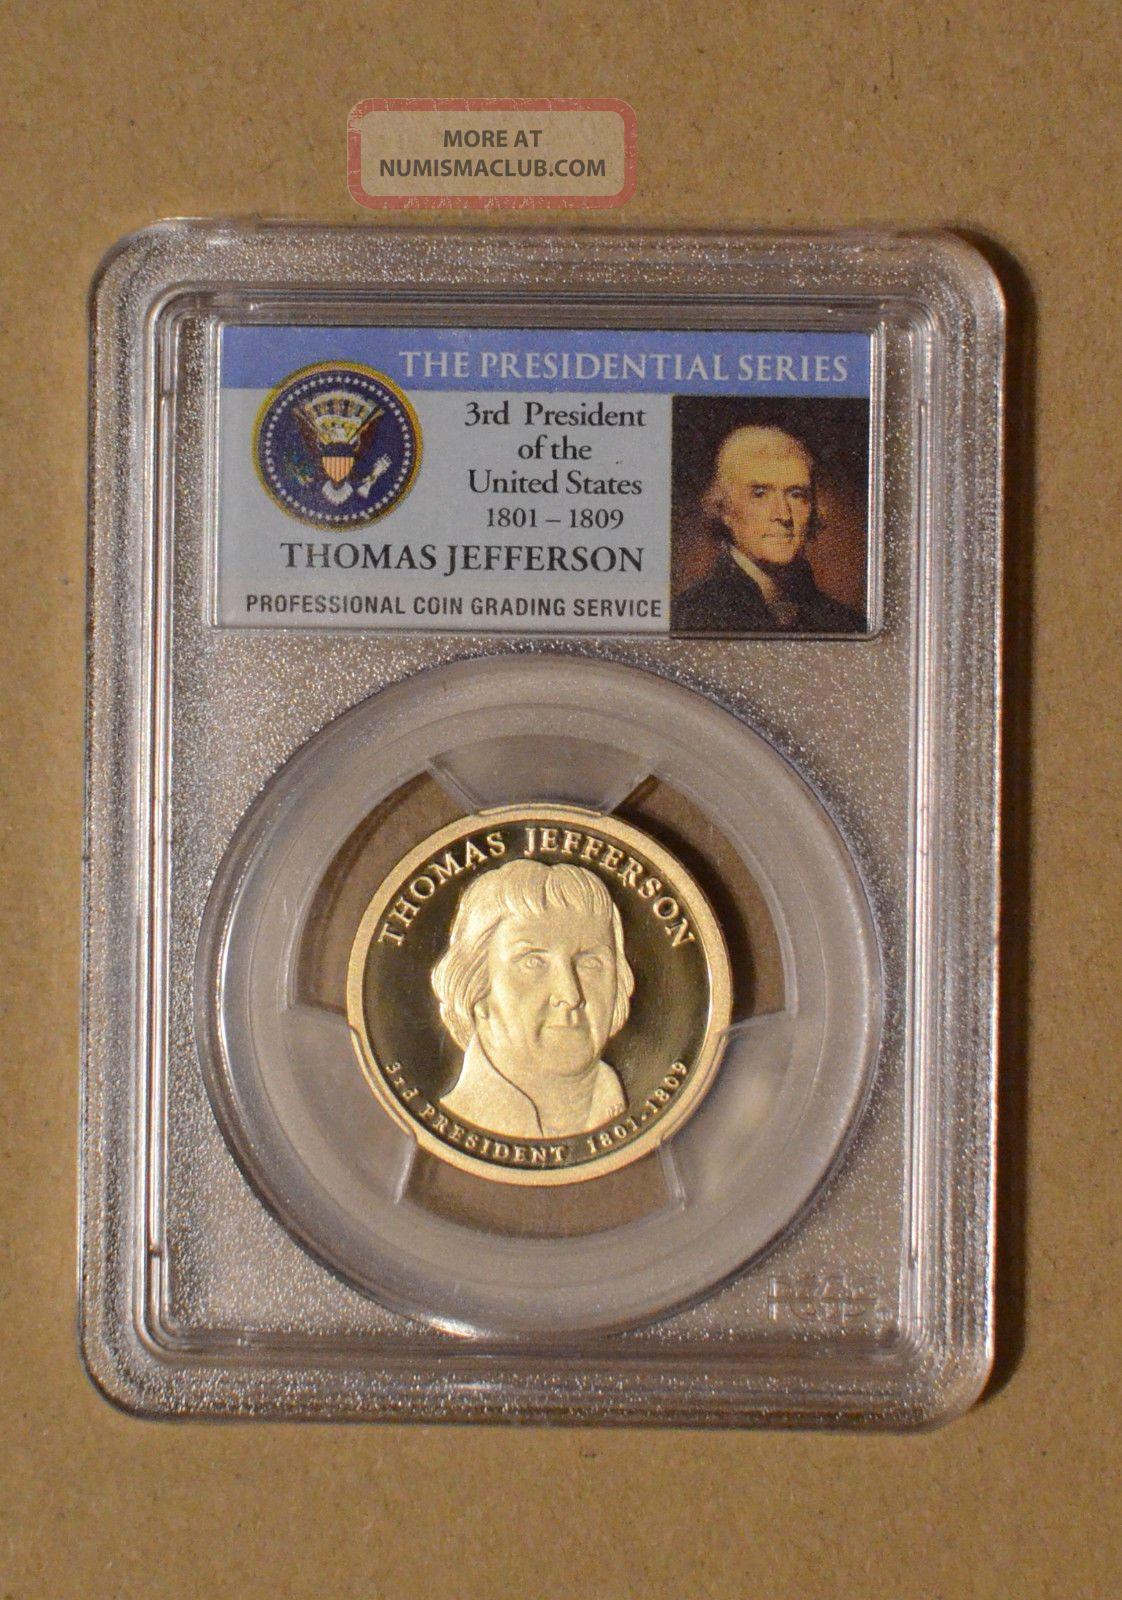 2007-S Thomas Jefferson 3rd President  Presidential Dollar PCGS PR69DCAM